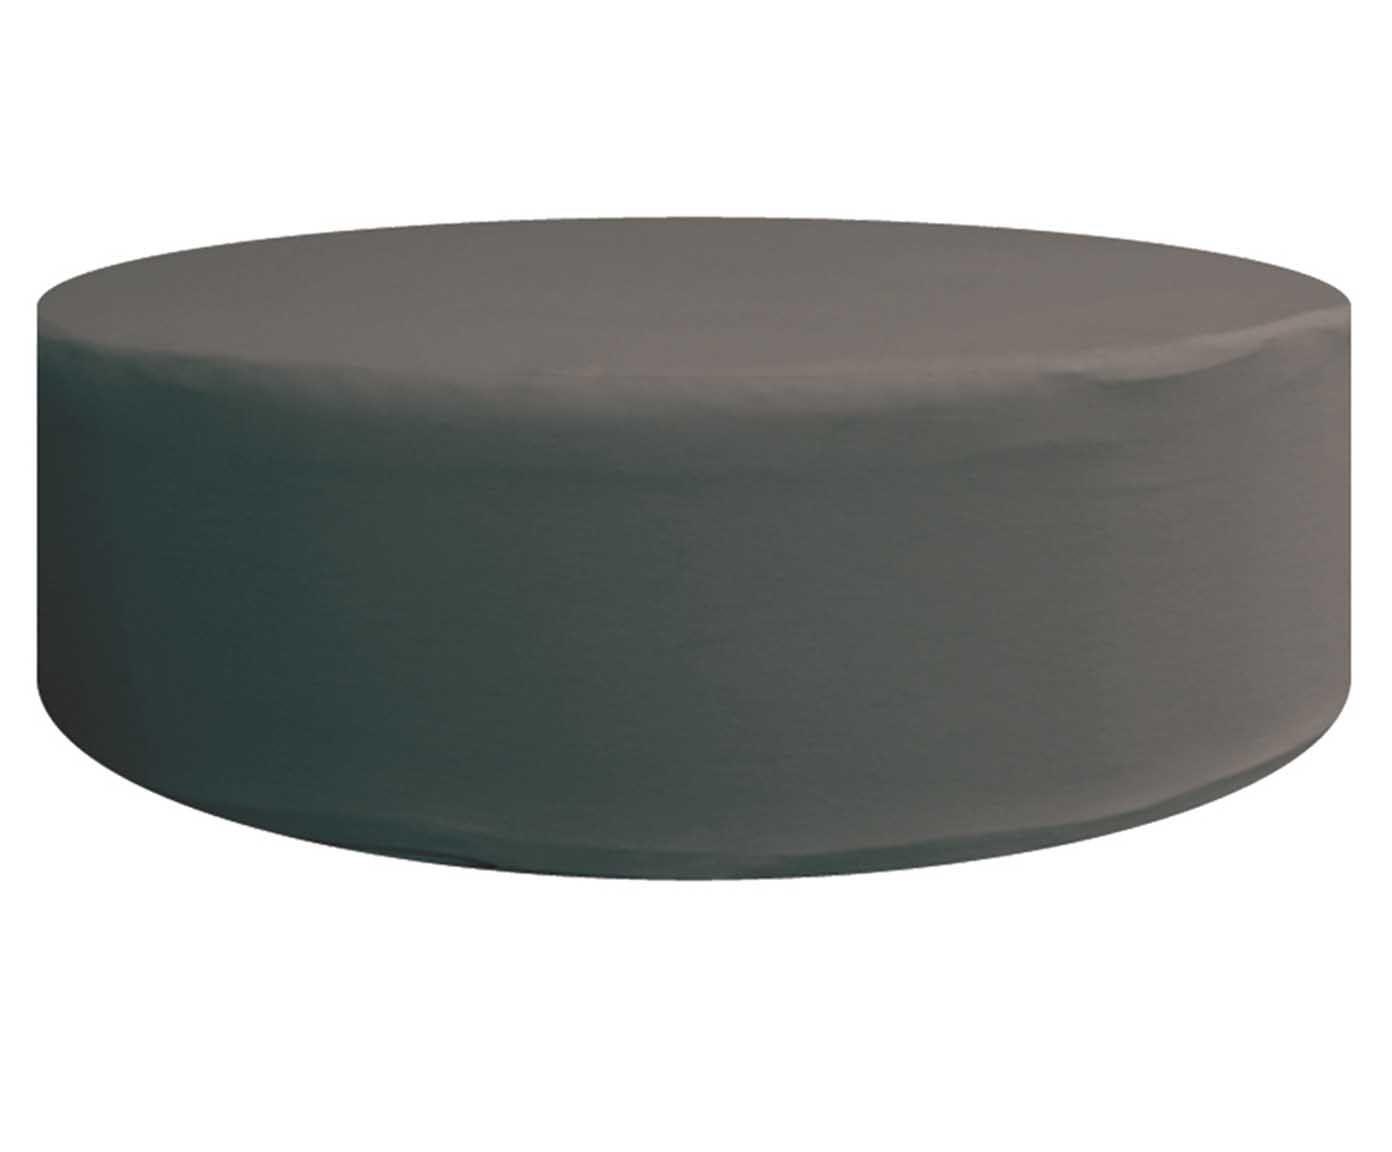 Pufe disco - nebbia | Westwing.com.br